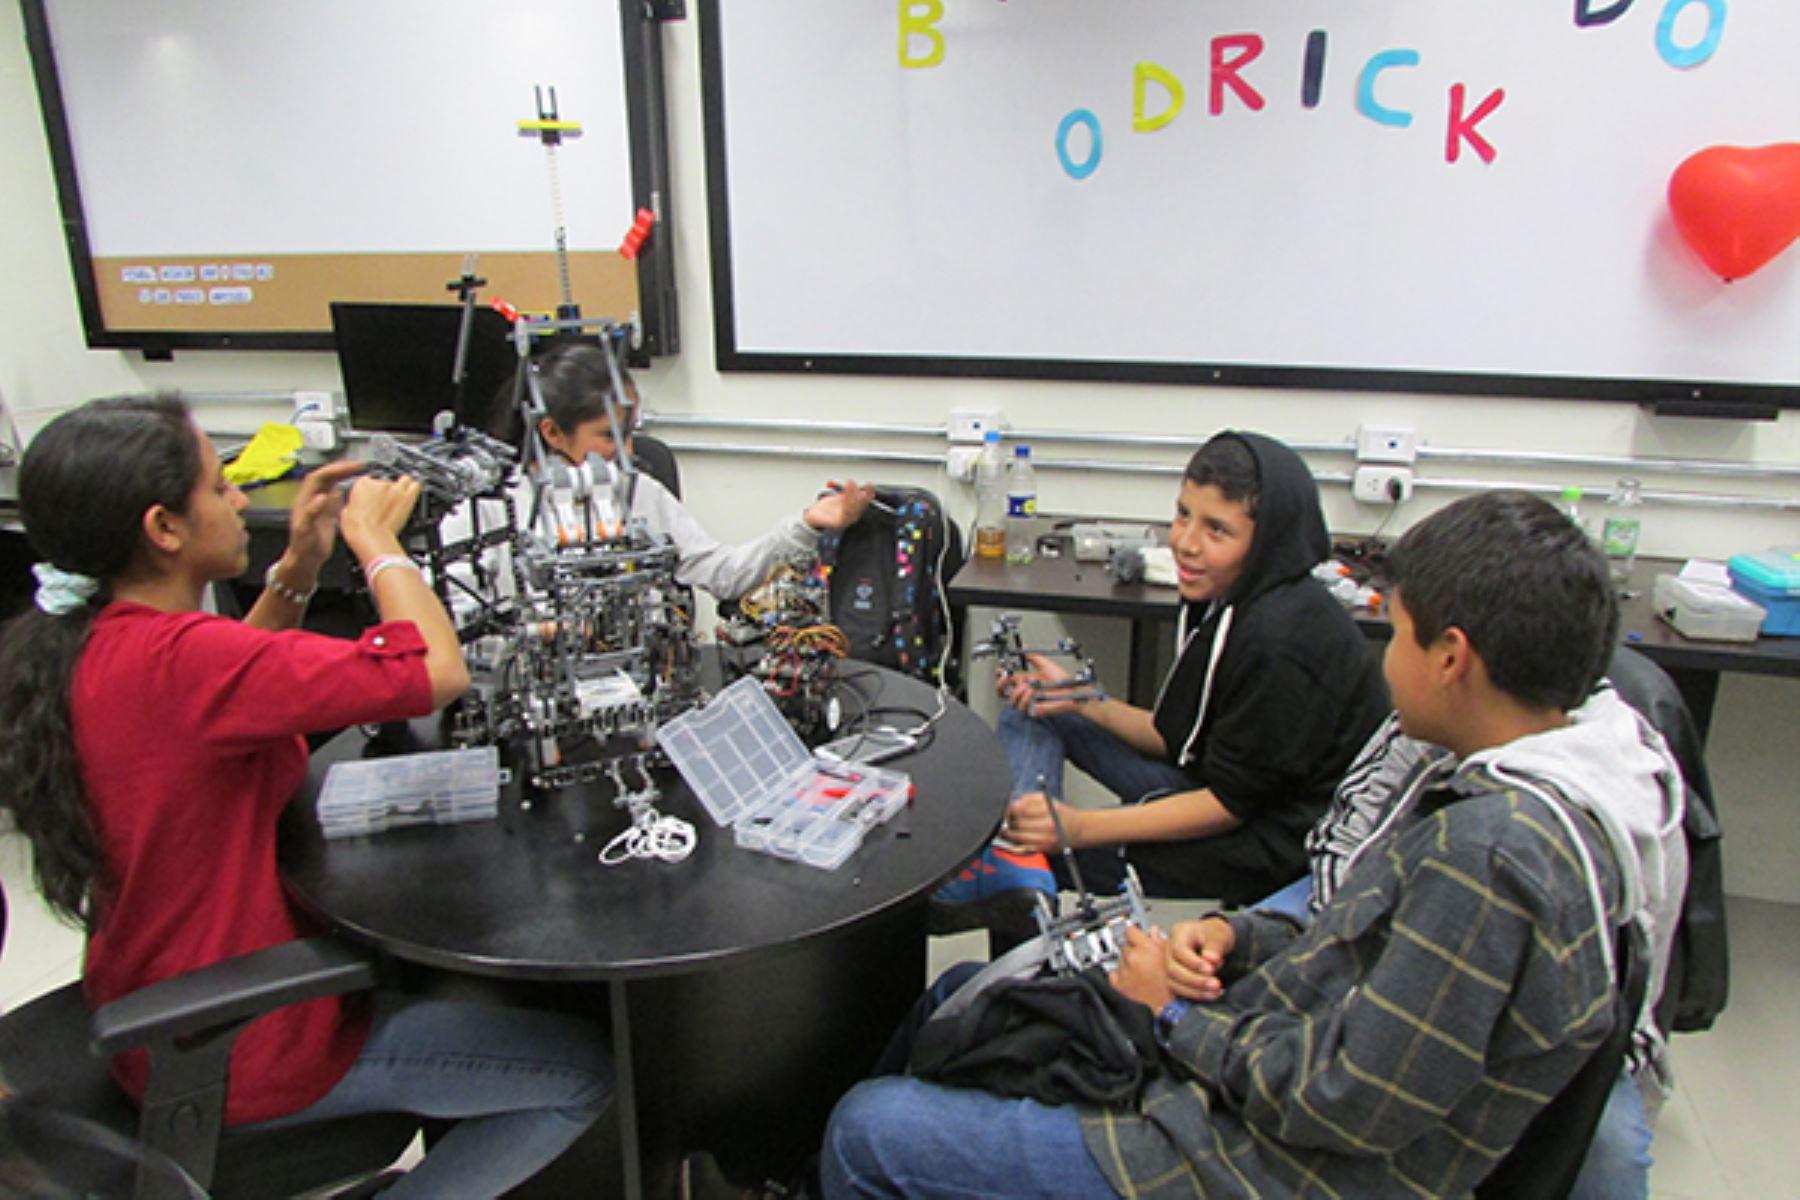 Delegación de estudiantes de Arequipa participará en Mundial de Robótica. ANDINA/Difusión